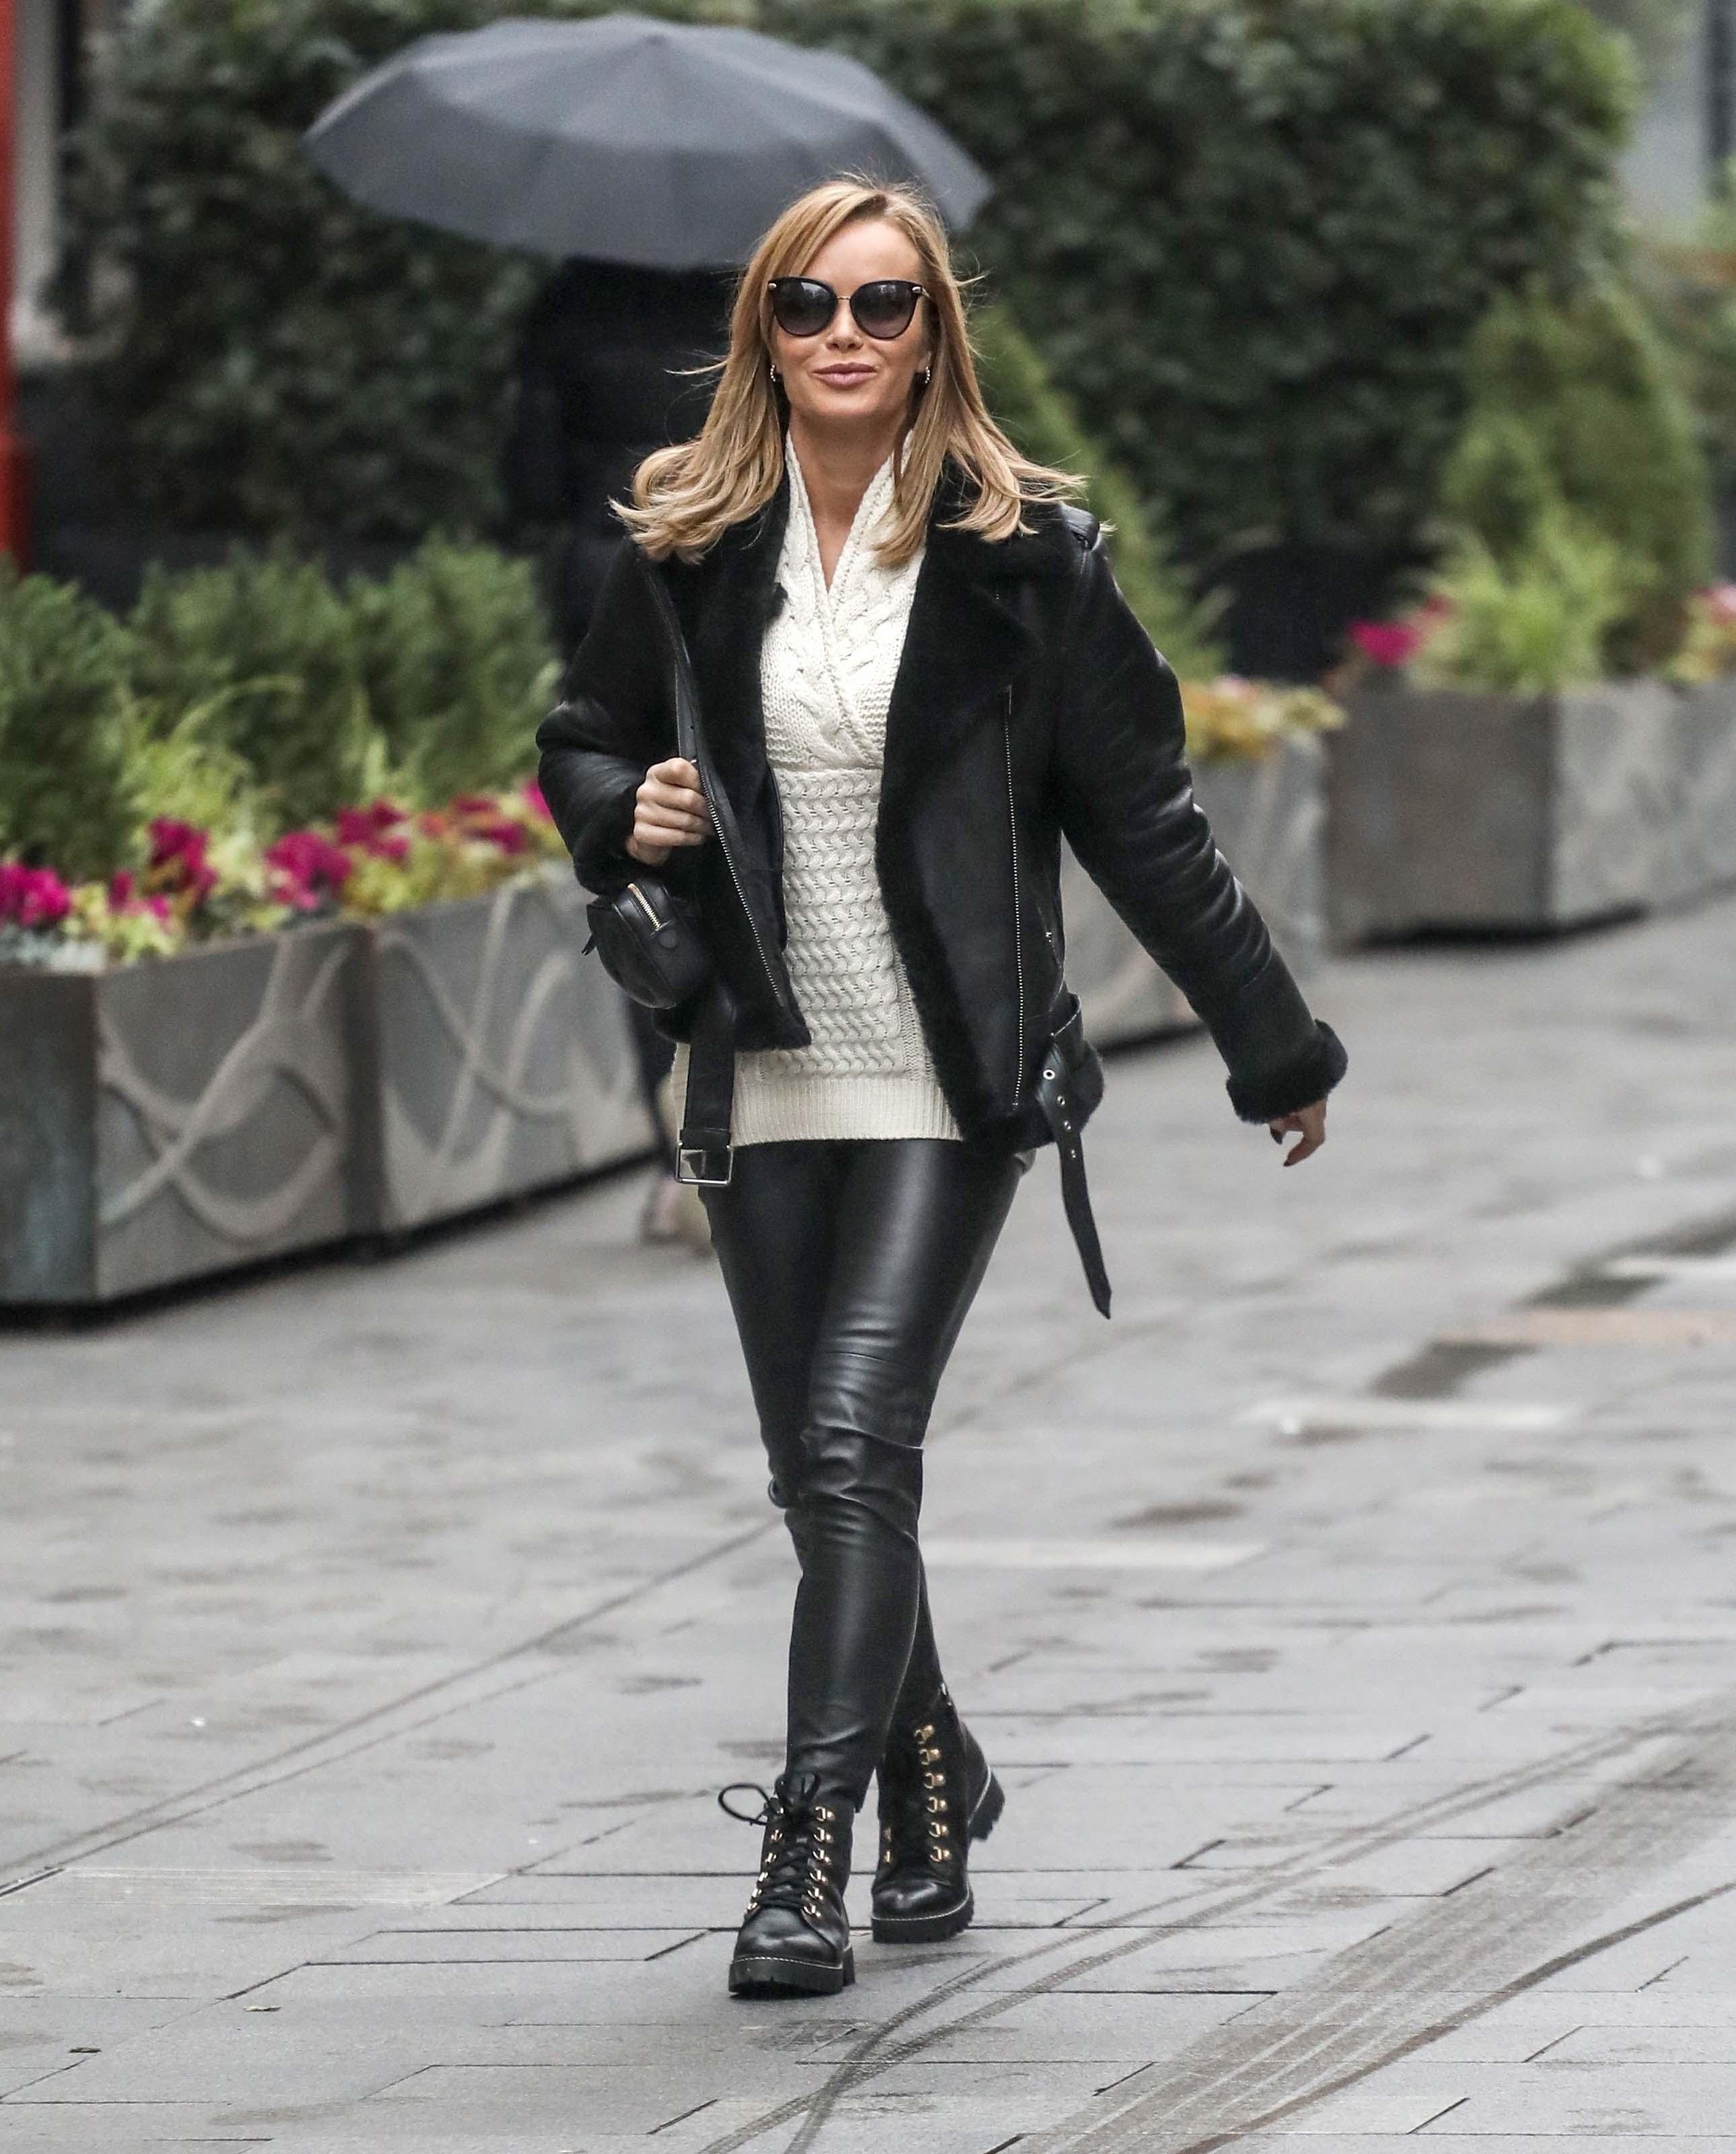 Amanda Holden leaving Global Radio in London